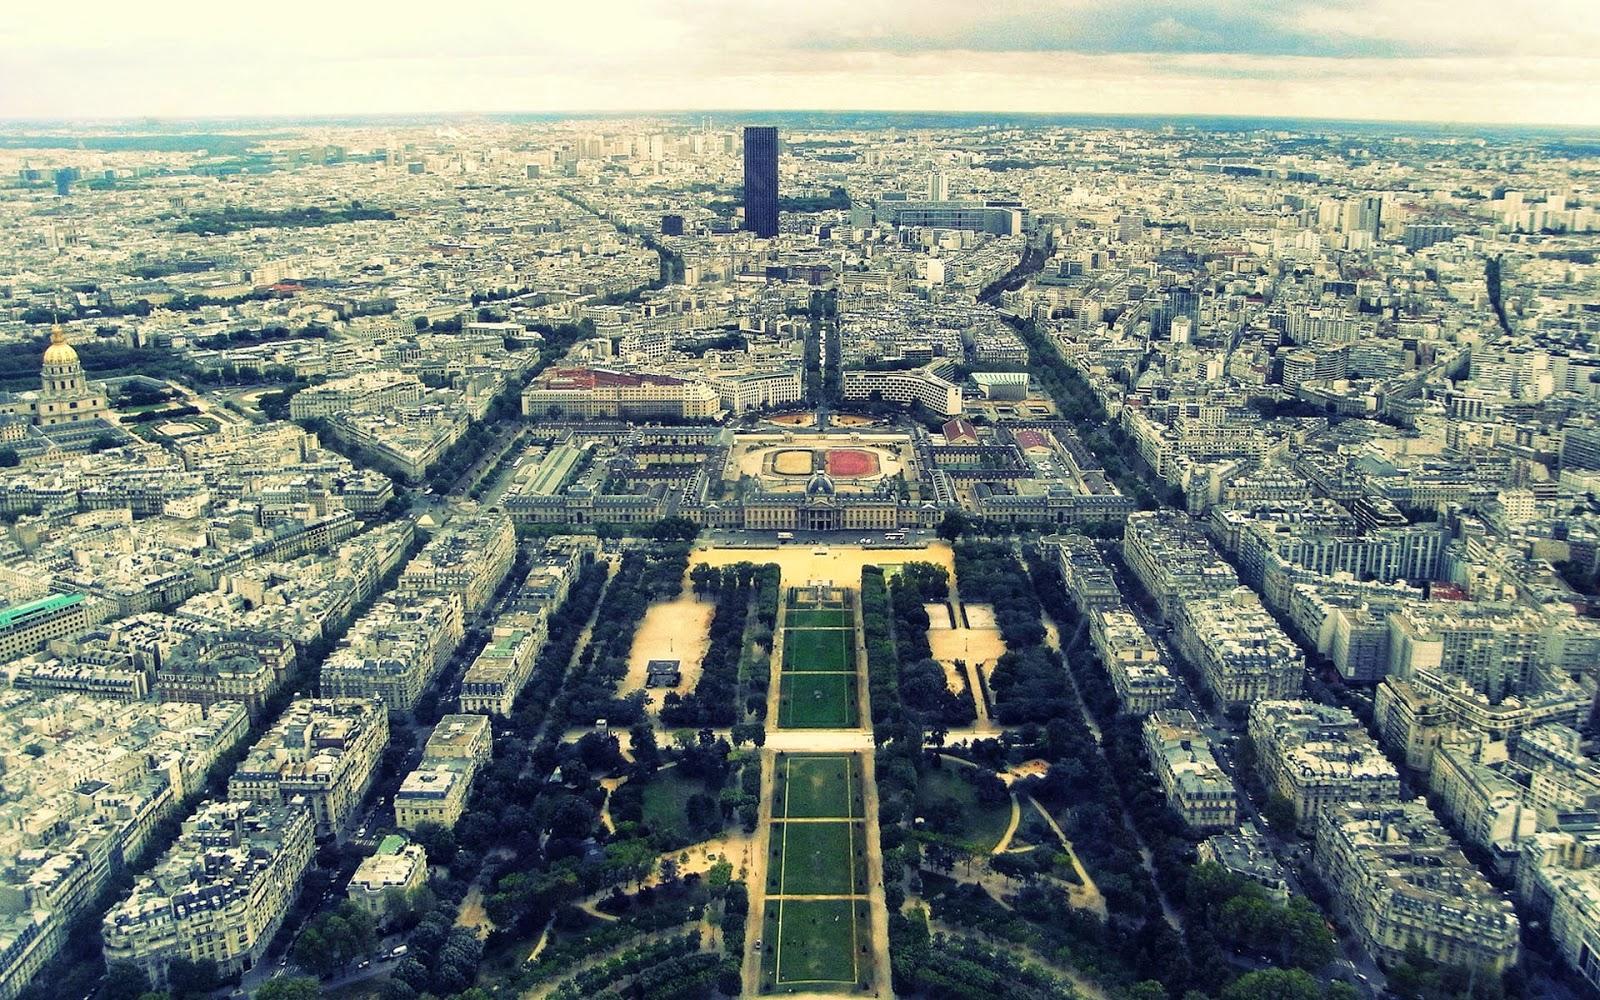 Must see Wallpaper High Quality Paris - Eiffel%2BTower%2BHd%2BHigh%2BQuality%2BWallpaper%2B%2B(1)  You Should Have_20487.jpg